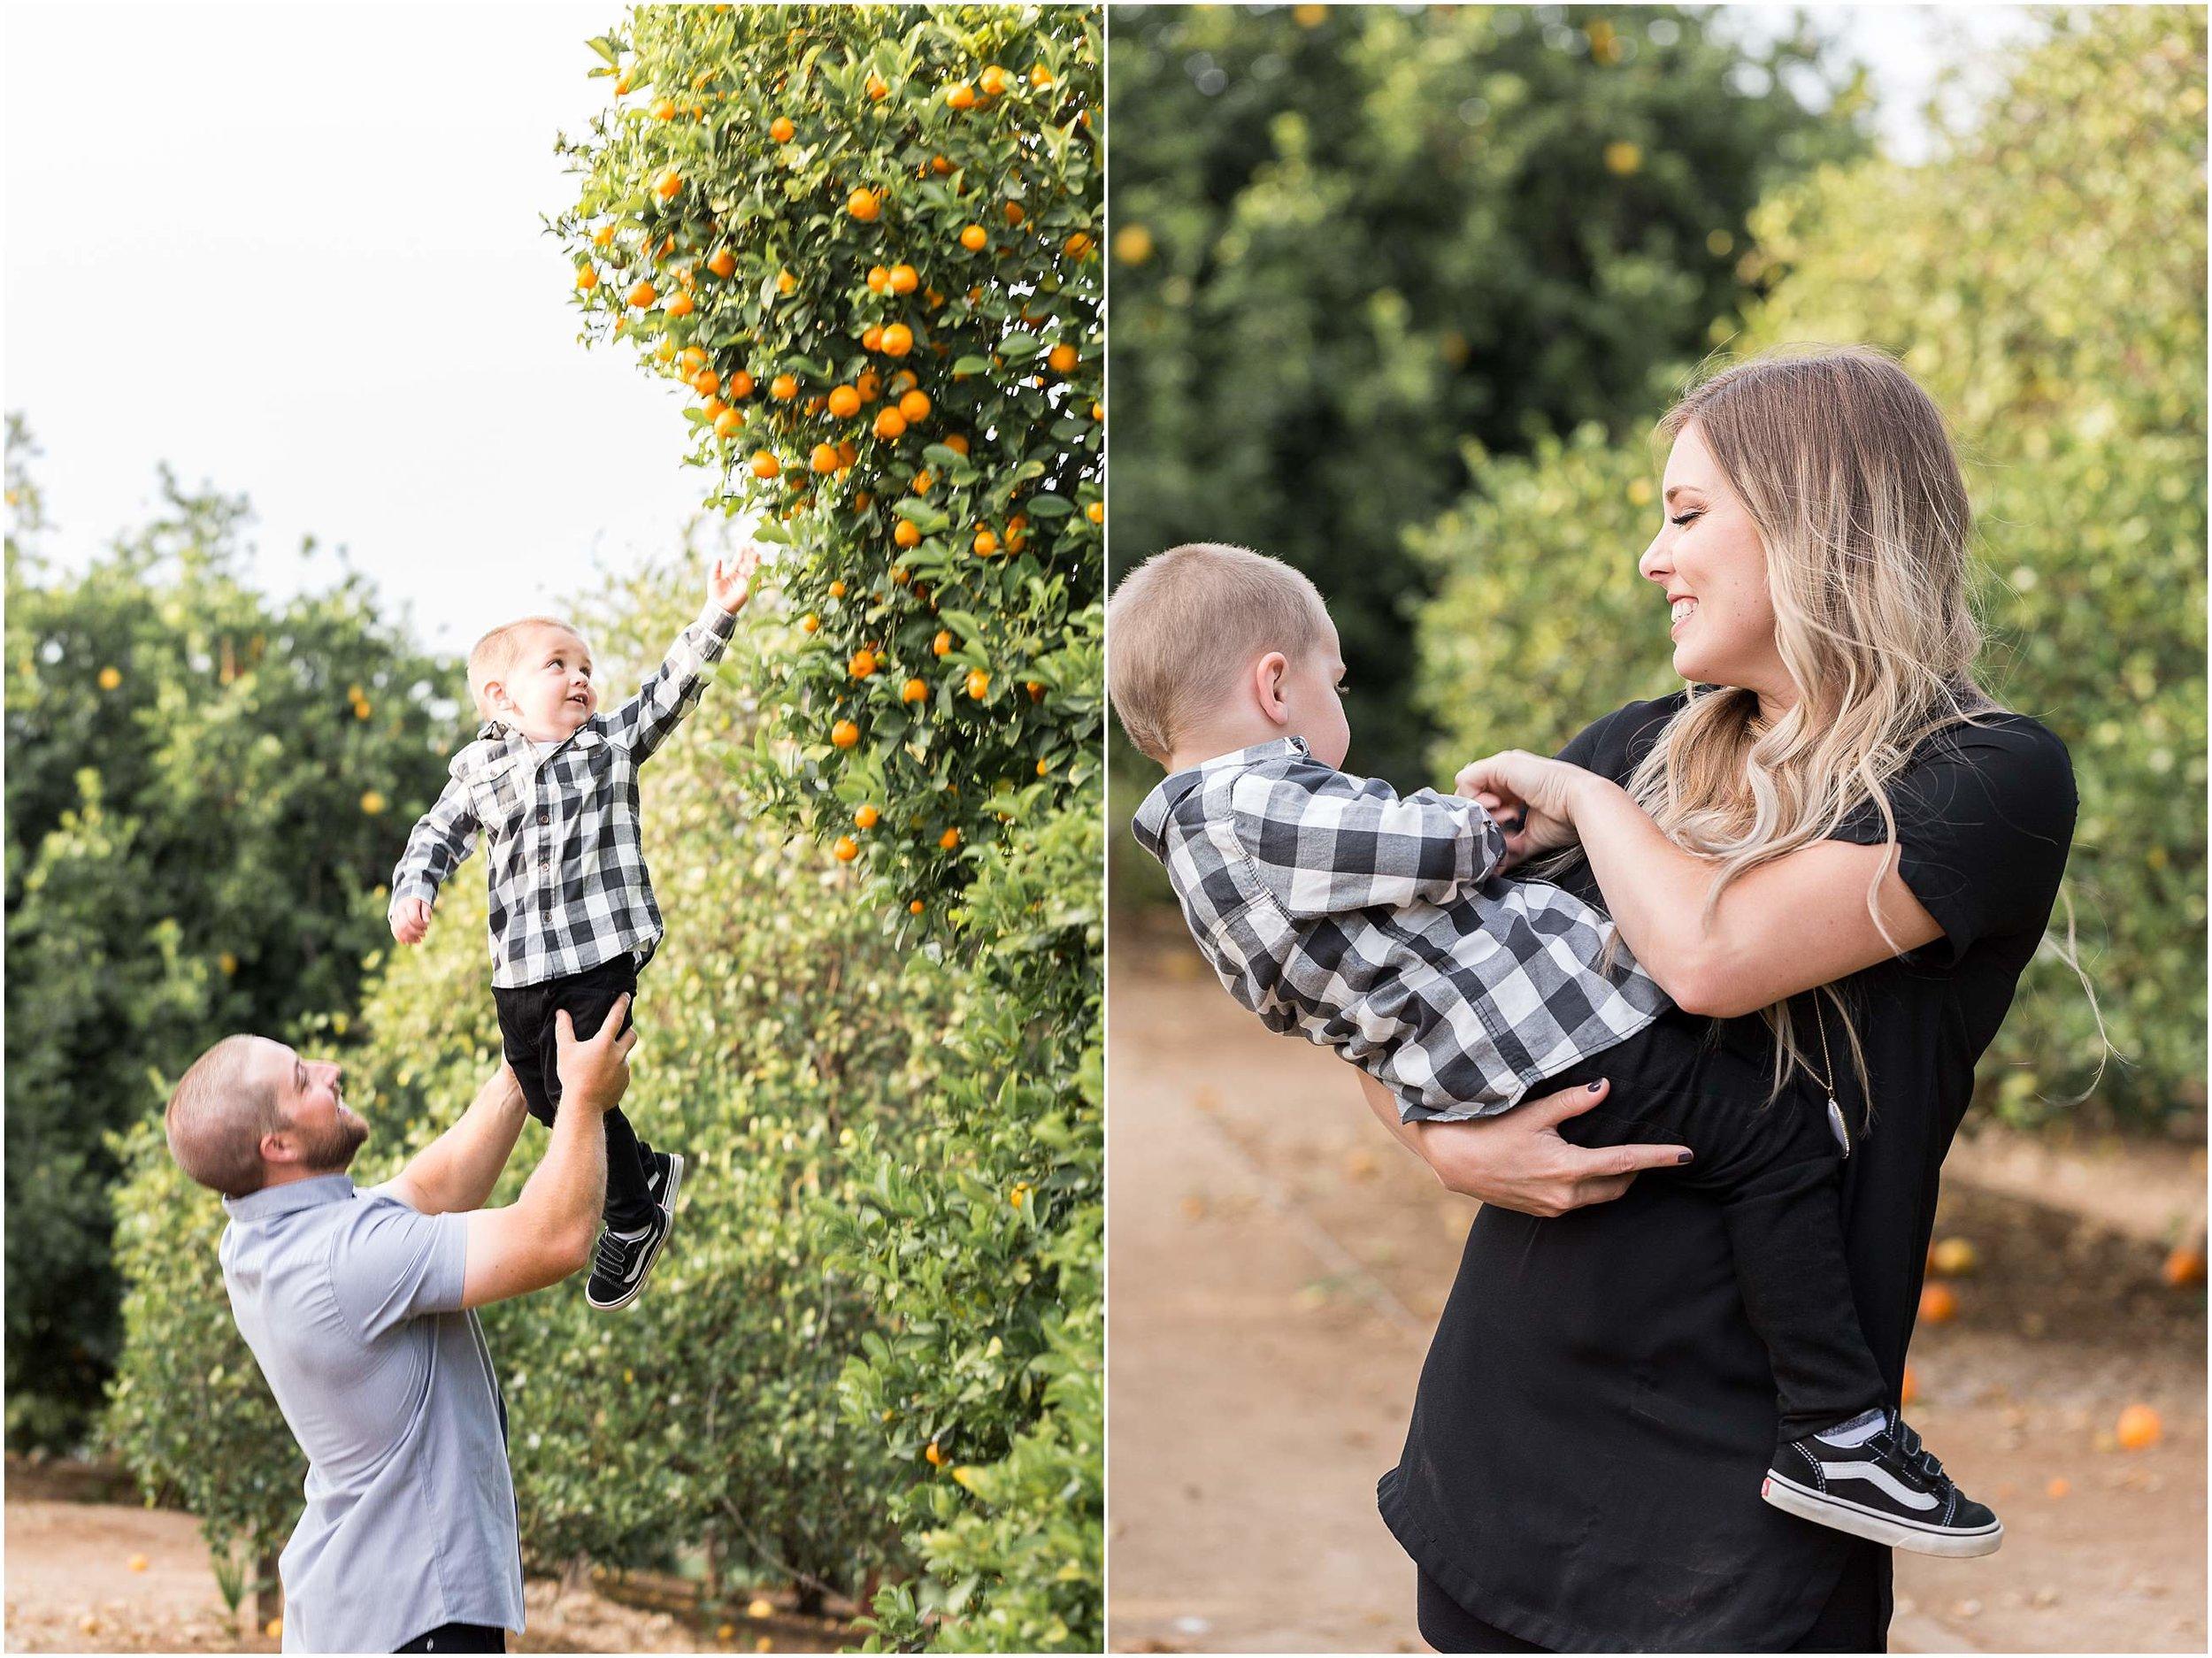 darianshantayphotography_family_photos_0008.jpg